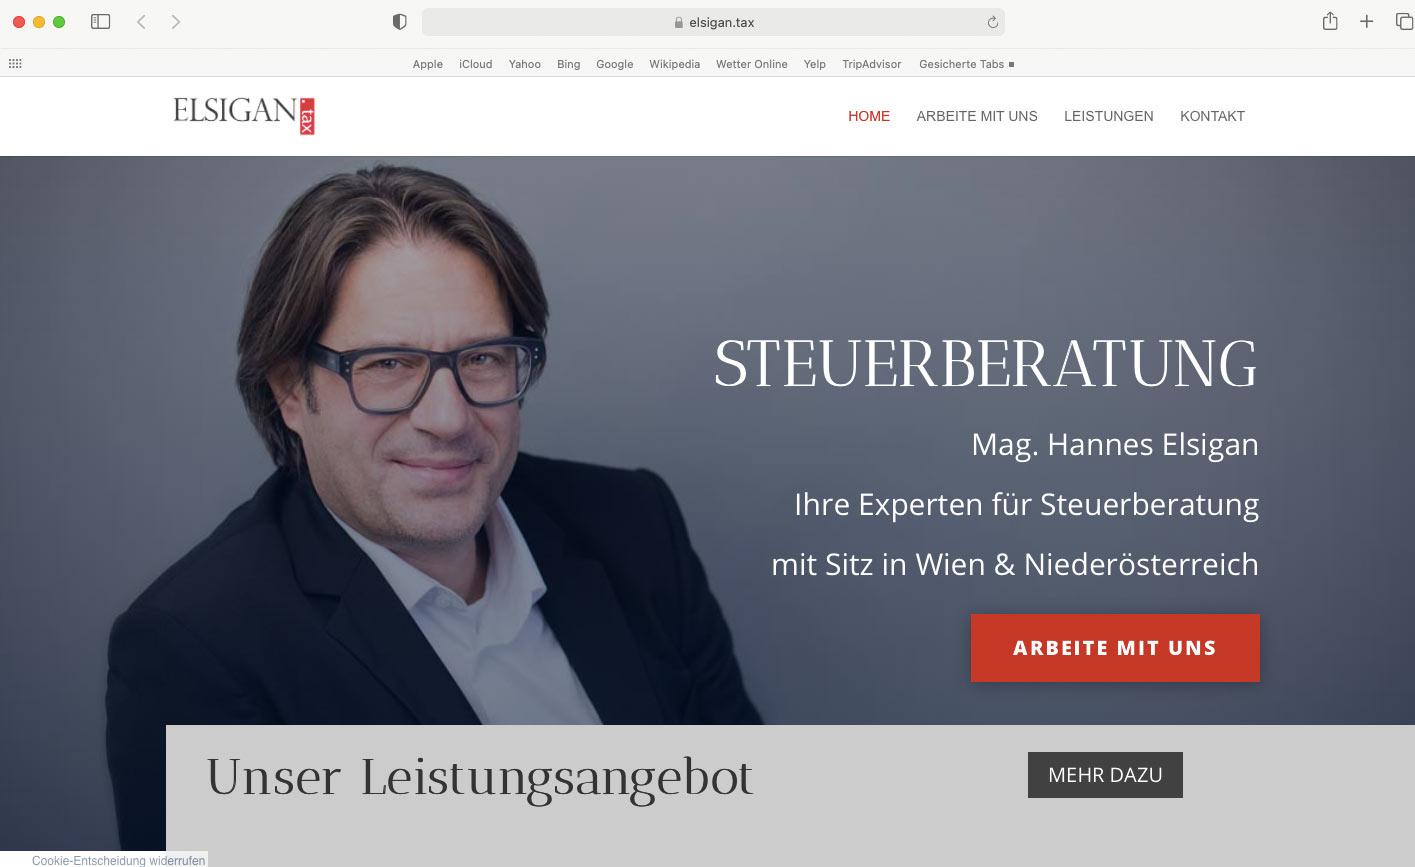 webseite-steuerberatung-hannes-elsigan